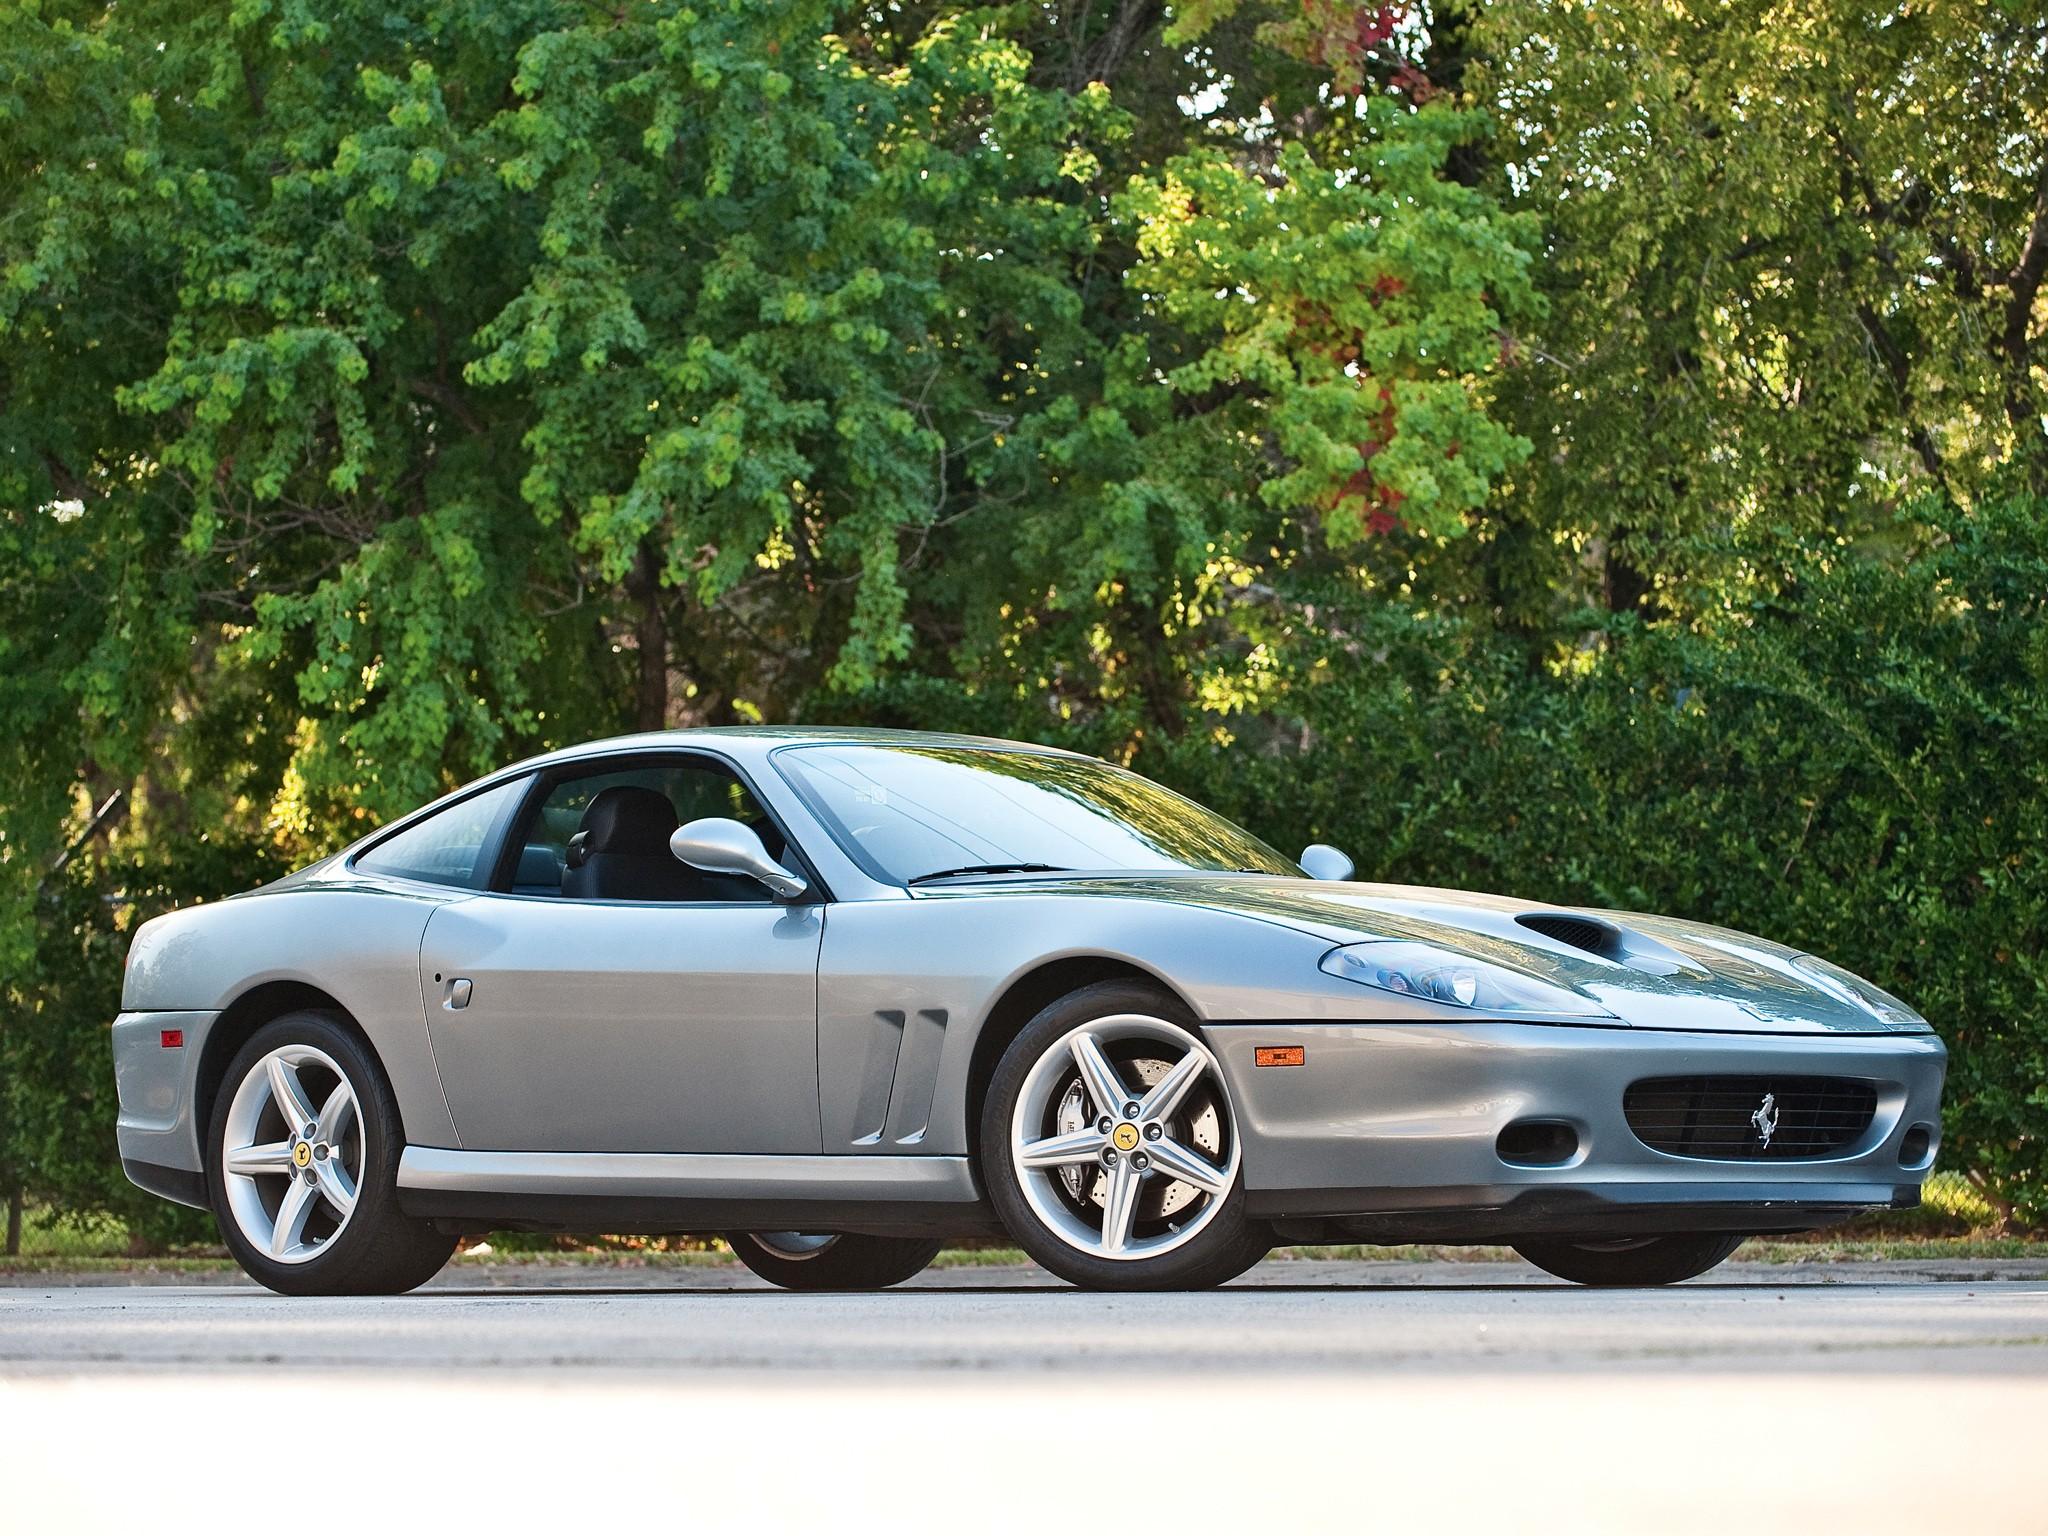 Ferrari 575m Maranello Spezifikationen Fotos 2002 2003 2004 2005 2006 Autoevolution In Deutscher Sprache